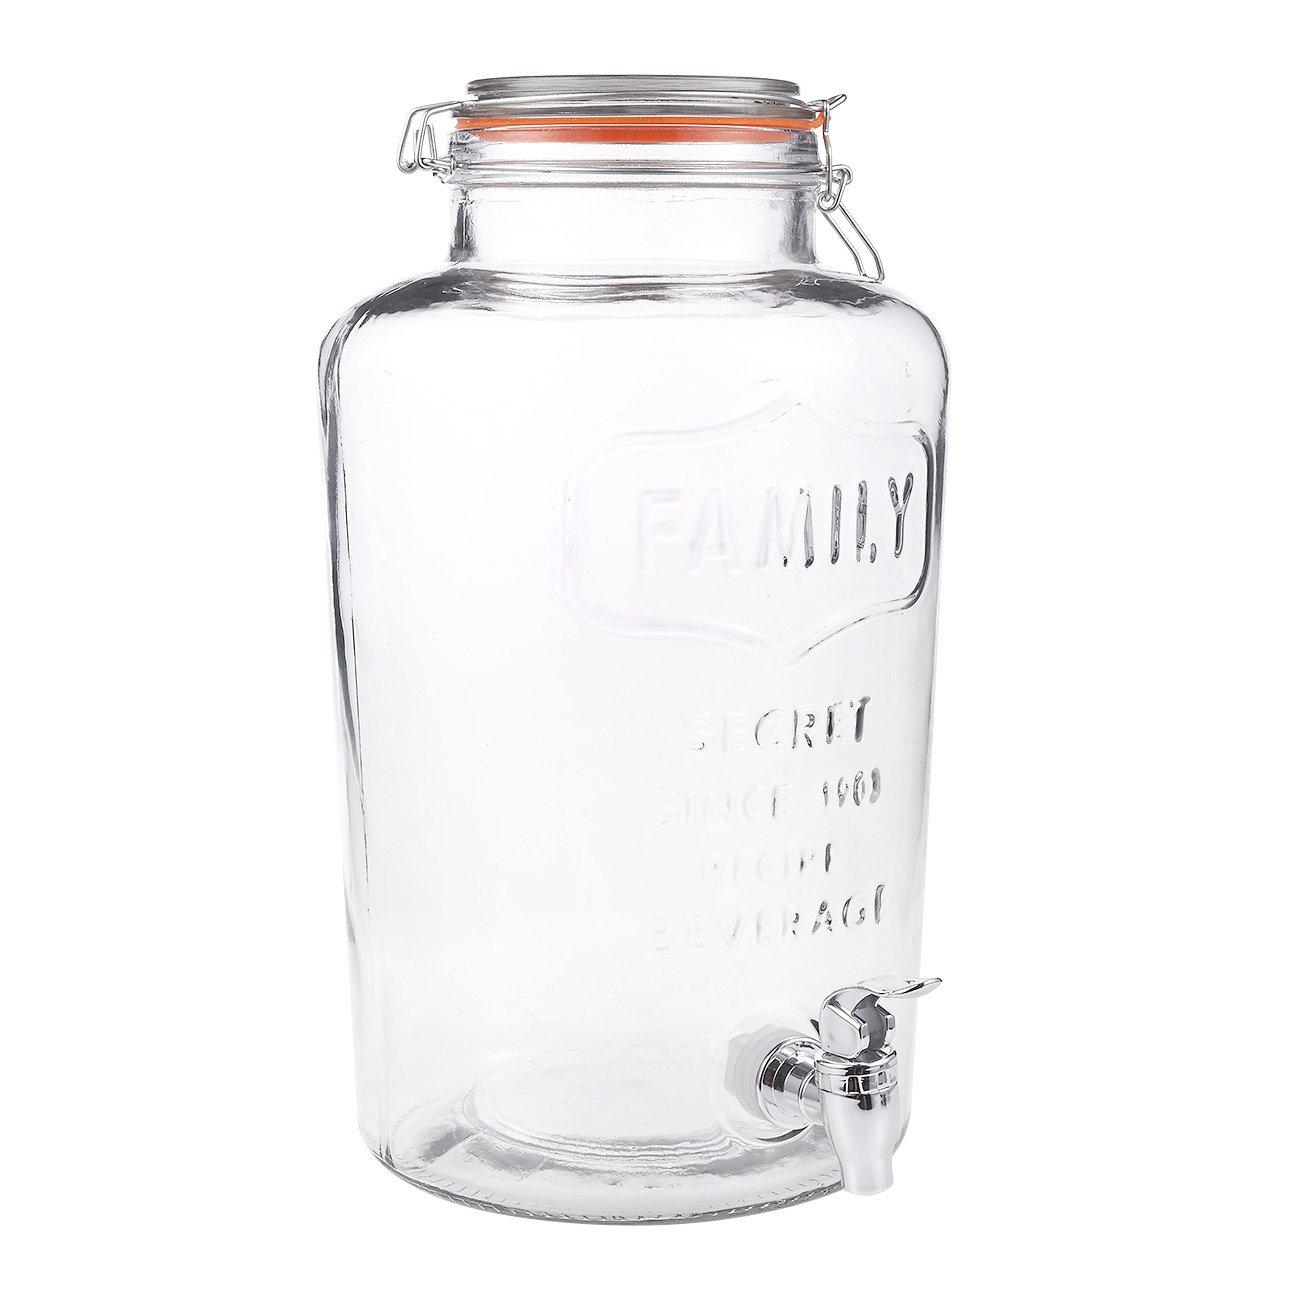 Juvale 8 Liter/ 2 Gallon Mason Jar Drink Dispenser - Glass Beverage Dispenser with Spigot and Bail Lid Closure